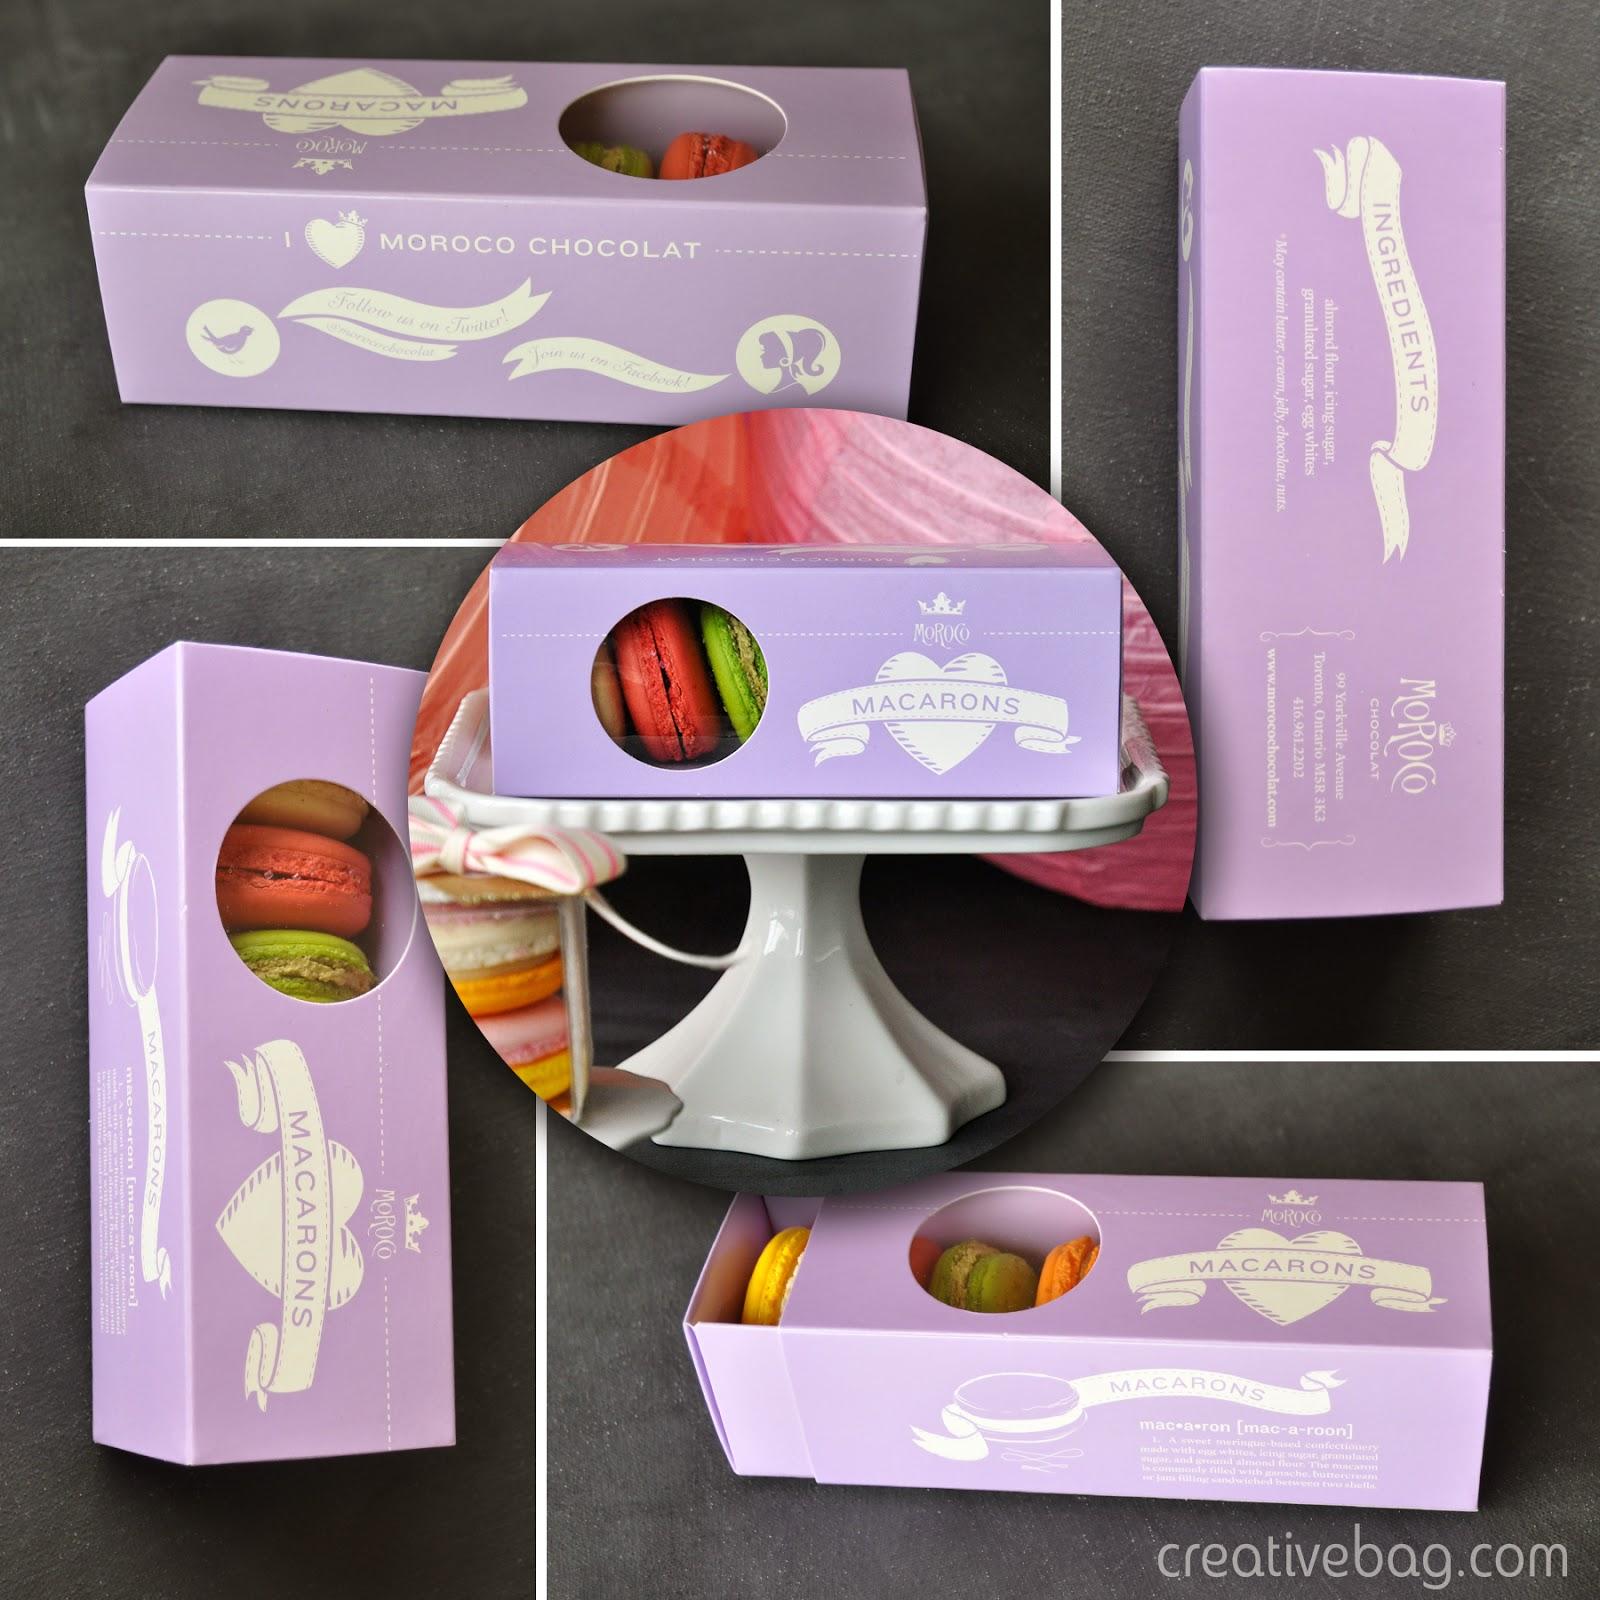 macaron packaging from CreativeBag.com   macarons from MoRoCocholate.com